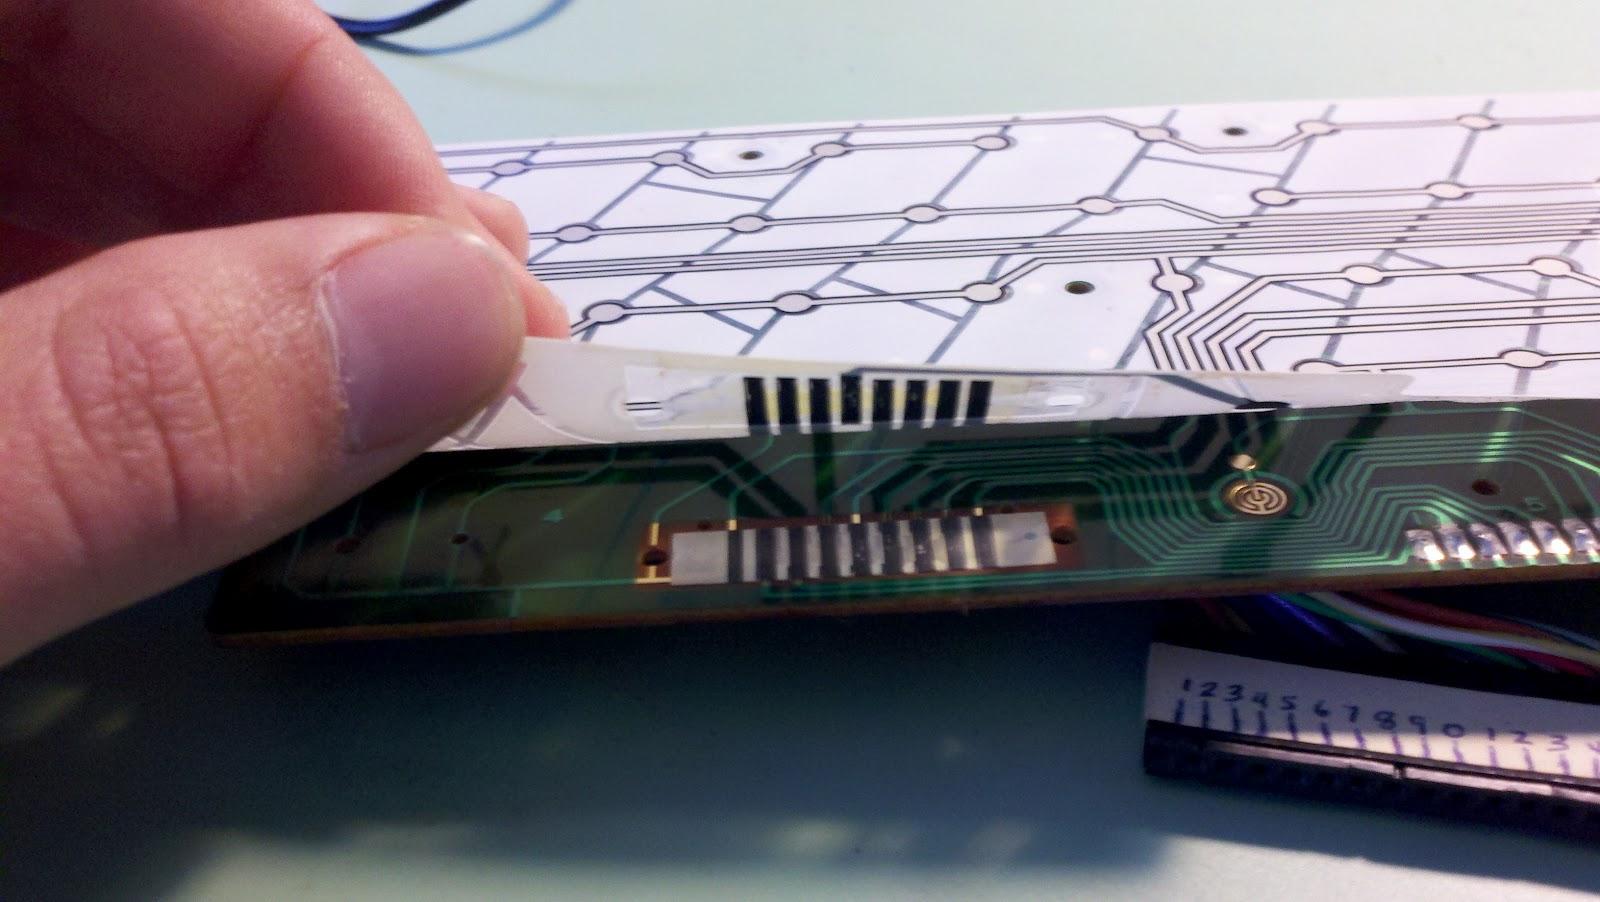 dkudrow: Atari 800 Keyboard